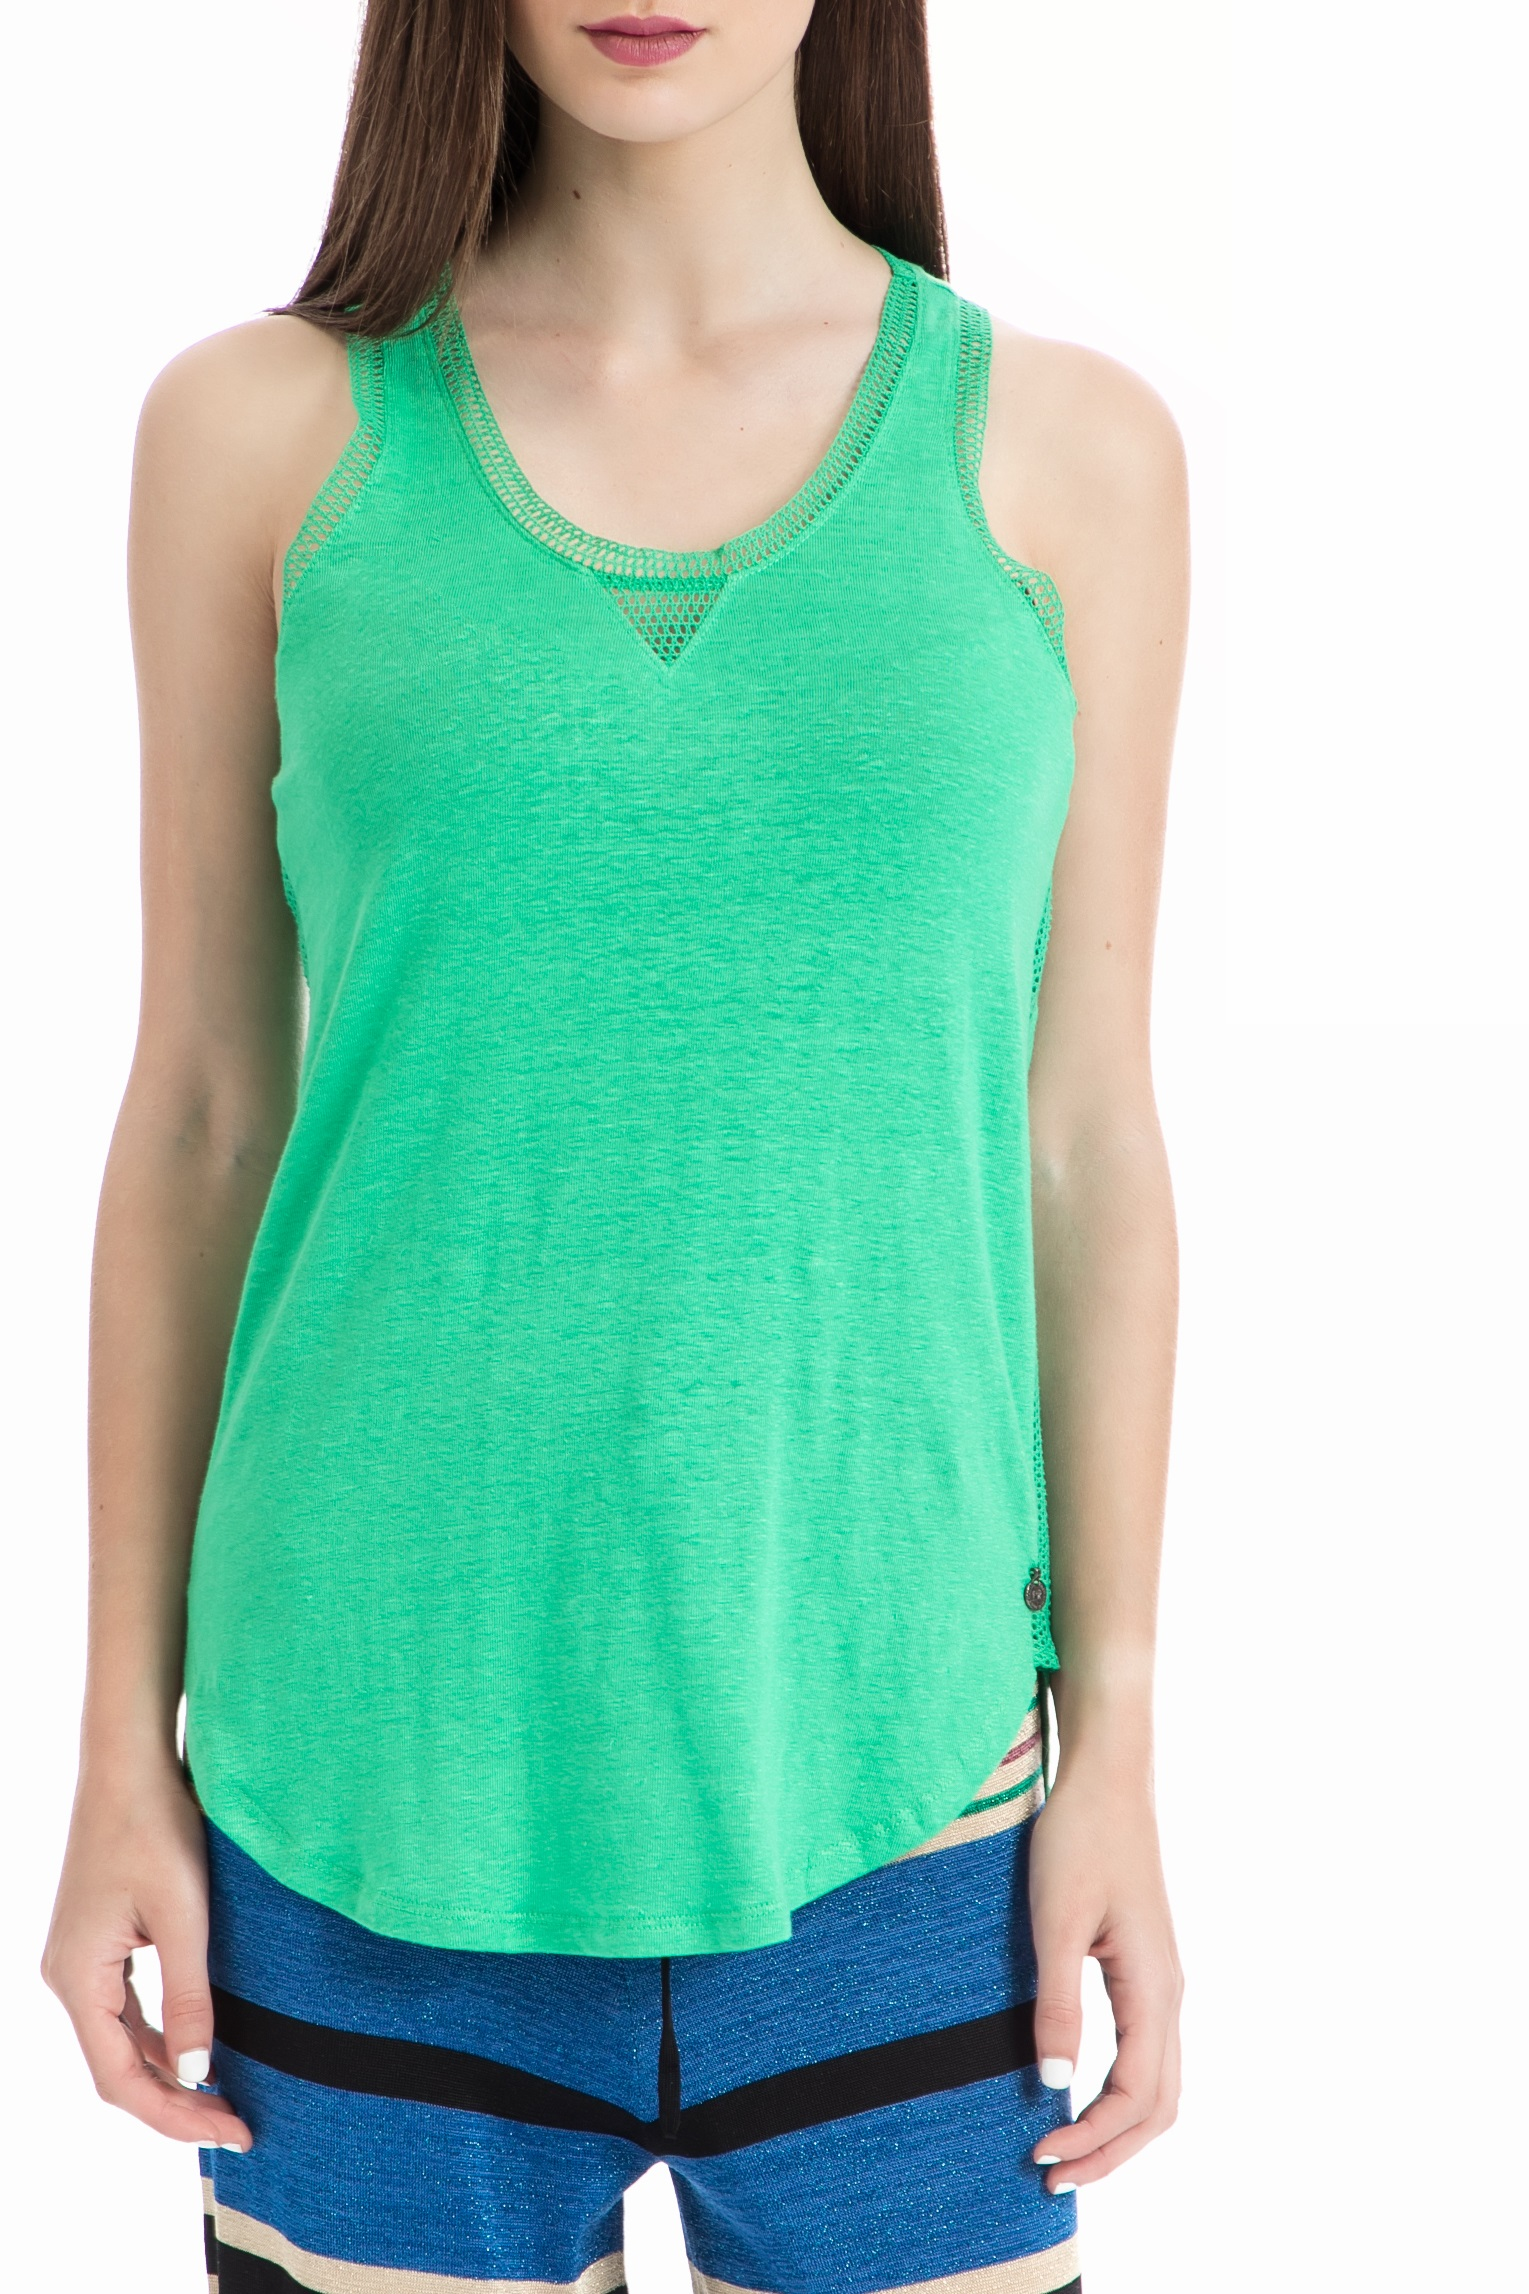 SCOTCH & SODA - Γυναικεία μπλούζα Maison Scotch πράσινη γυναικεία ρούχα μπλούζες αμάνικες